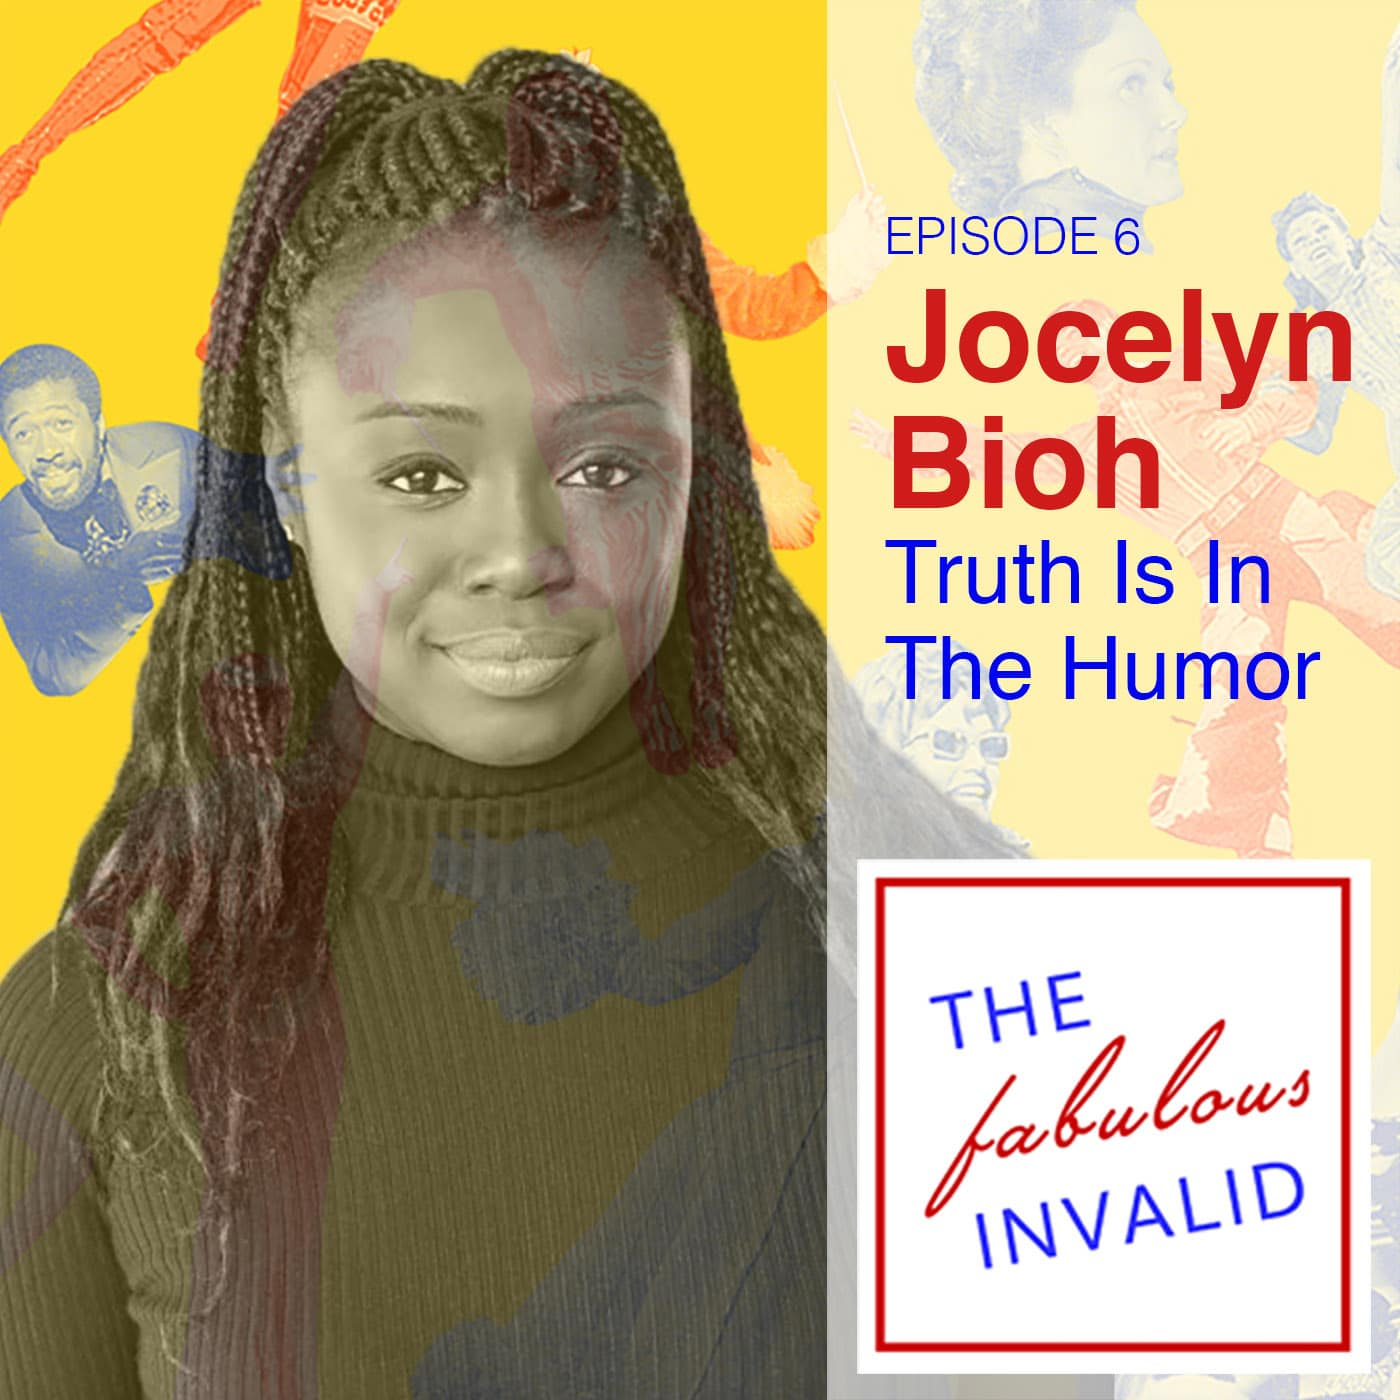 The Fabulous Invalid Ep 6 Jocelyn Bioh